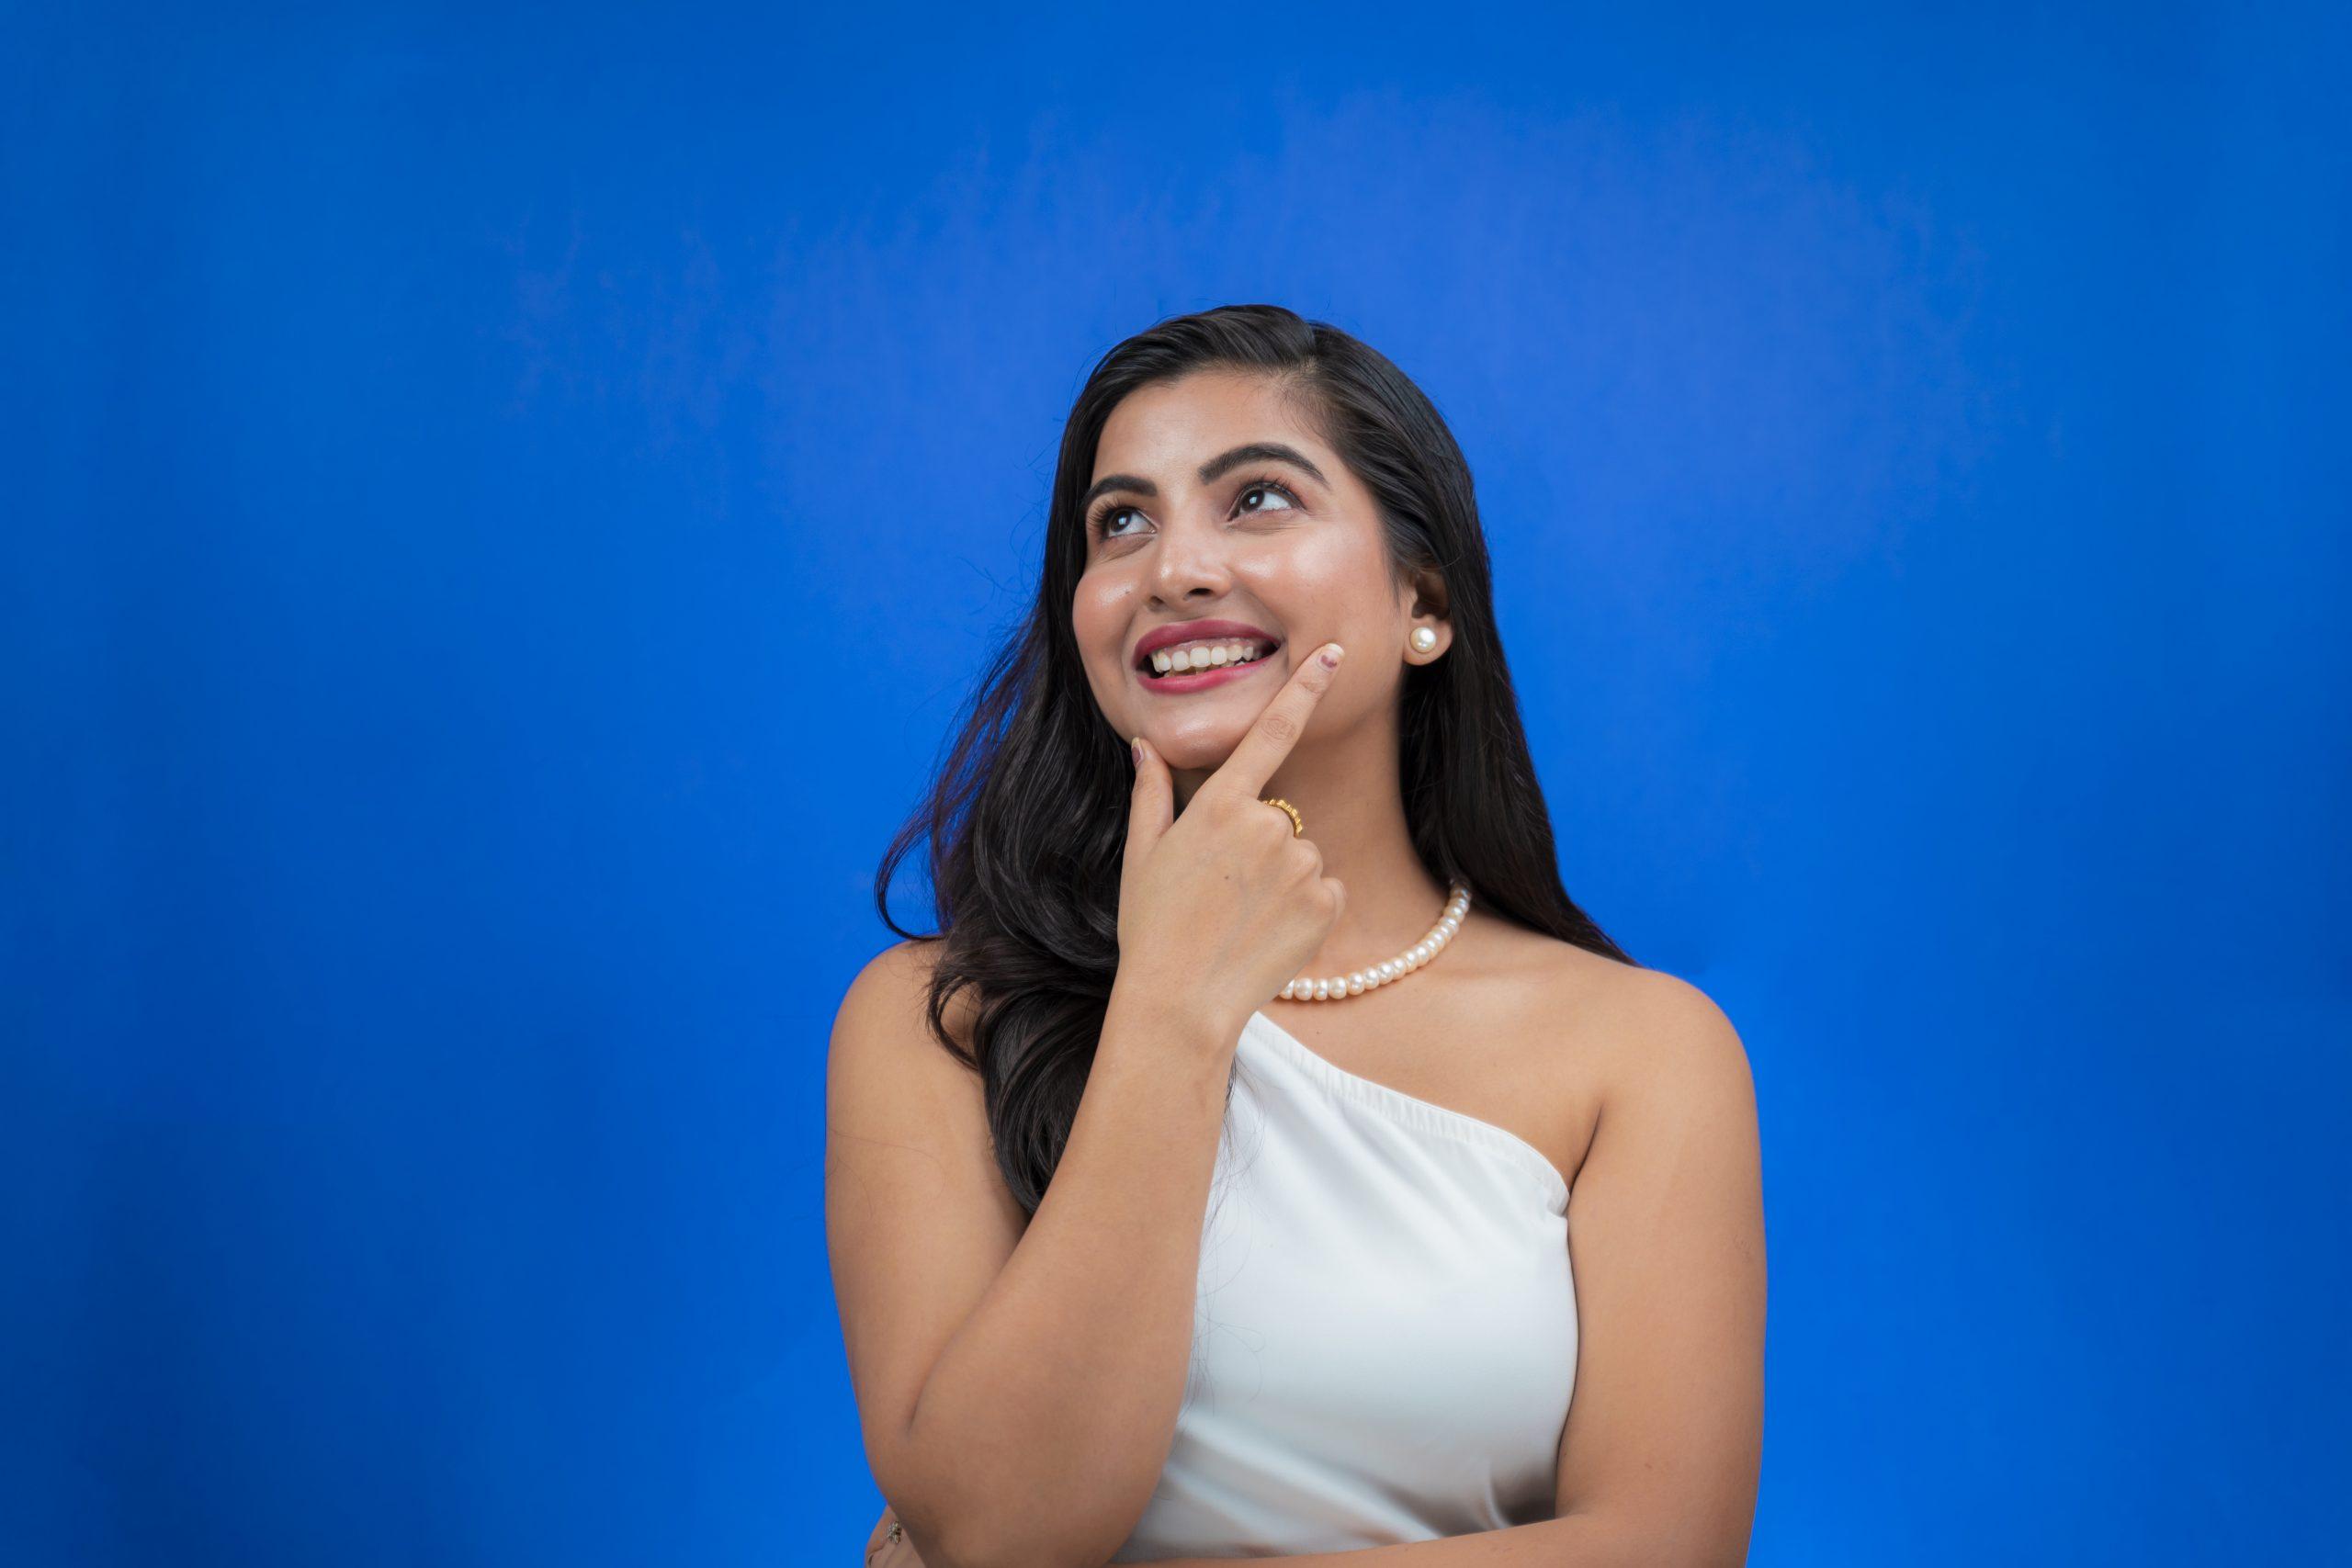 Elegant model smiling